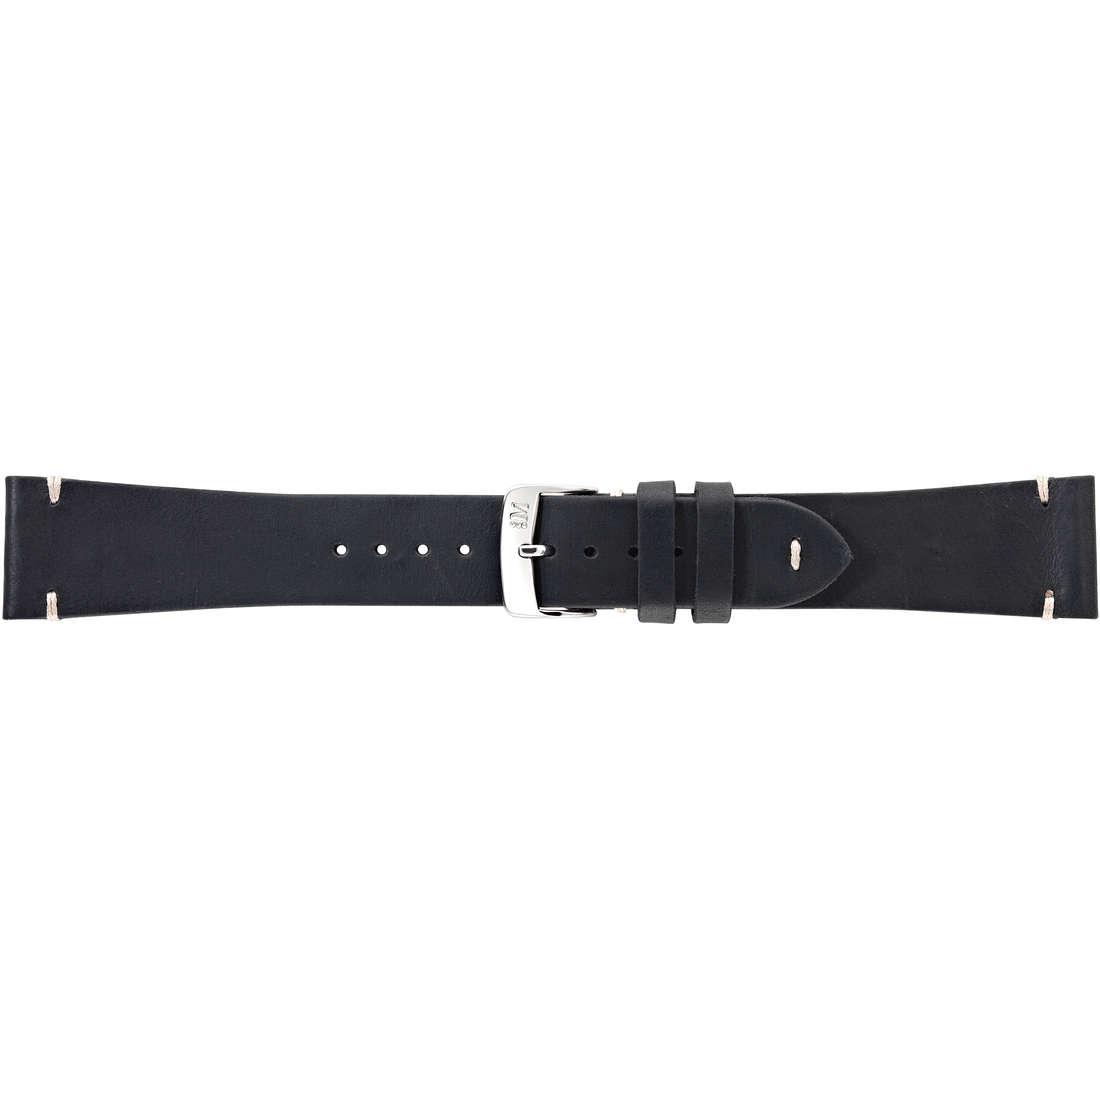 montre bande de montres homme Morellato Manufatti A01X4541A76019CR18